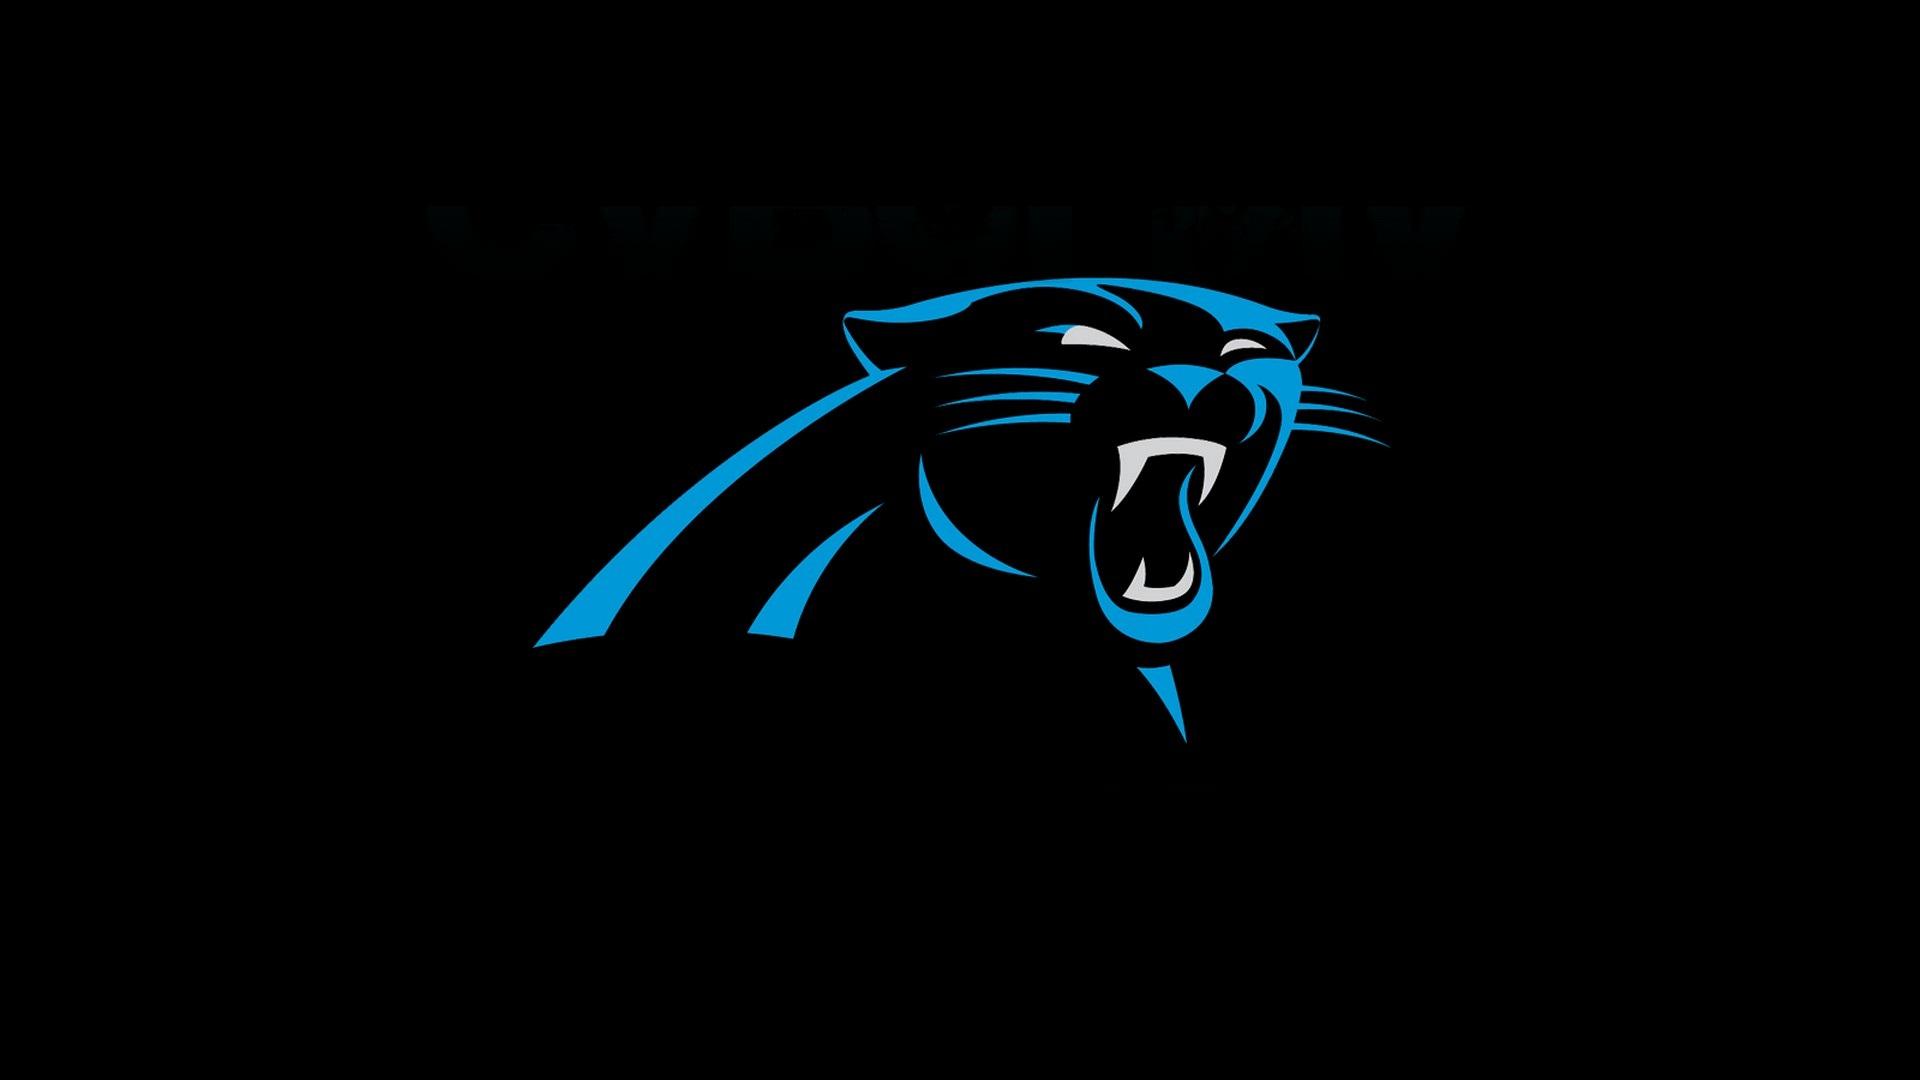 Superman Hd Iphone Wallpaper Carolina Panthers Wallpaper Hd 2018 Nfl Football Wallpapers